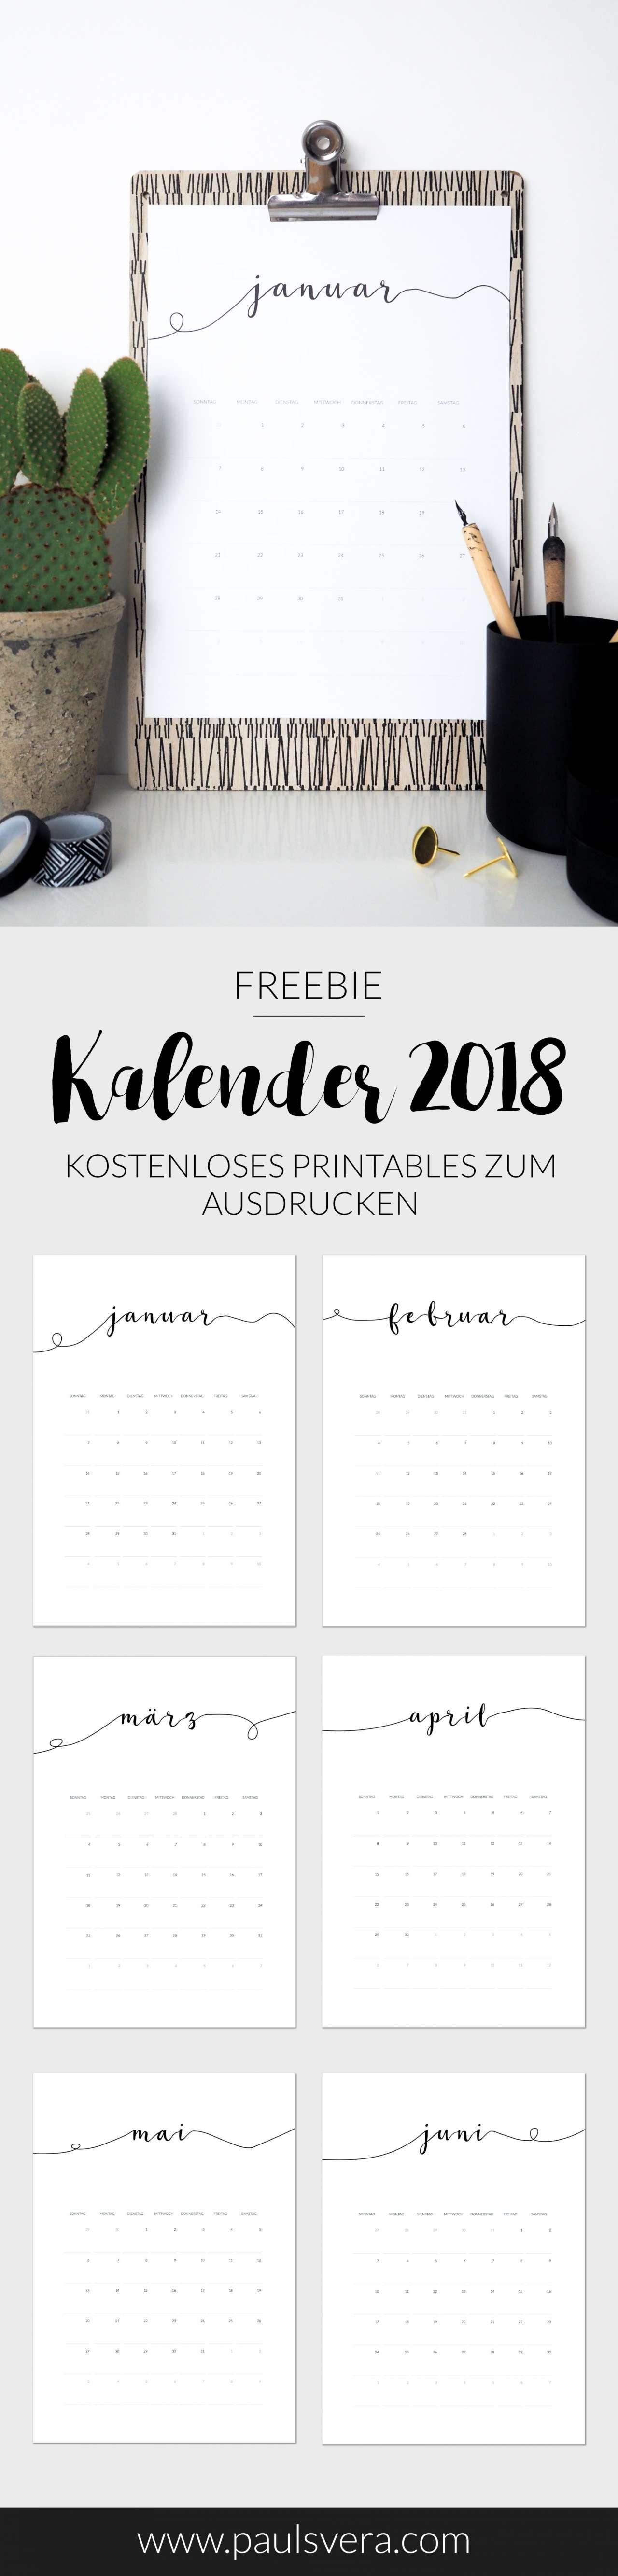 freebie kalender 2018 als kostenloses printables pretty. Black Bedroom Furniture Sets. Home Design Ideas